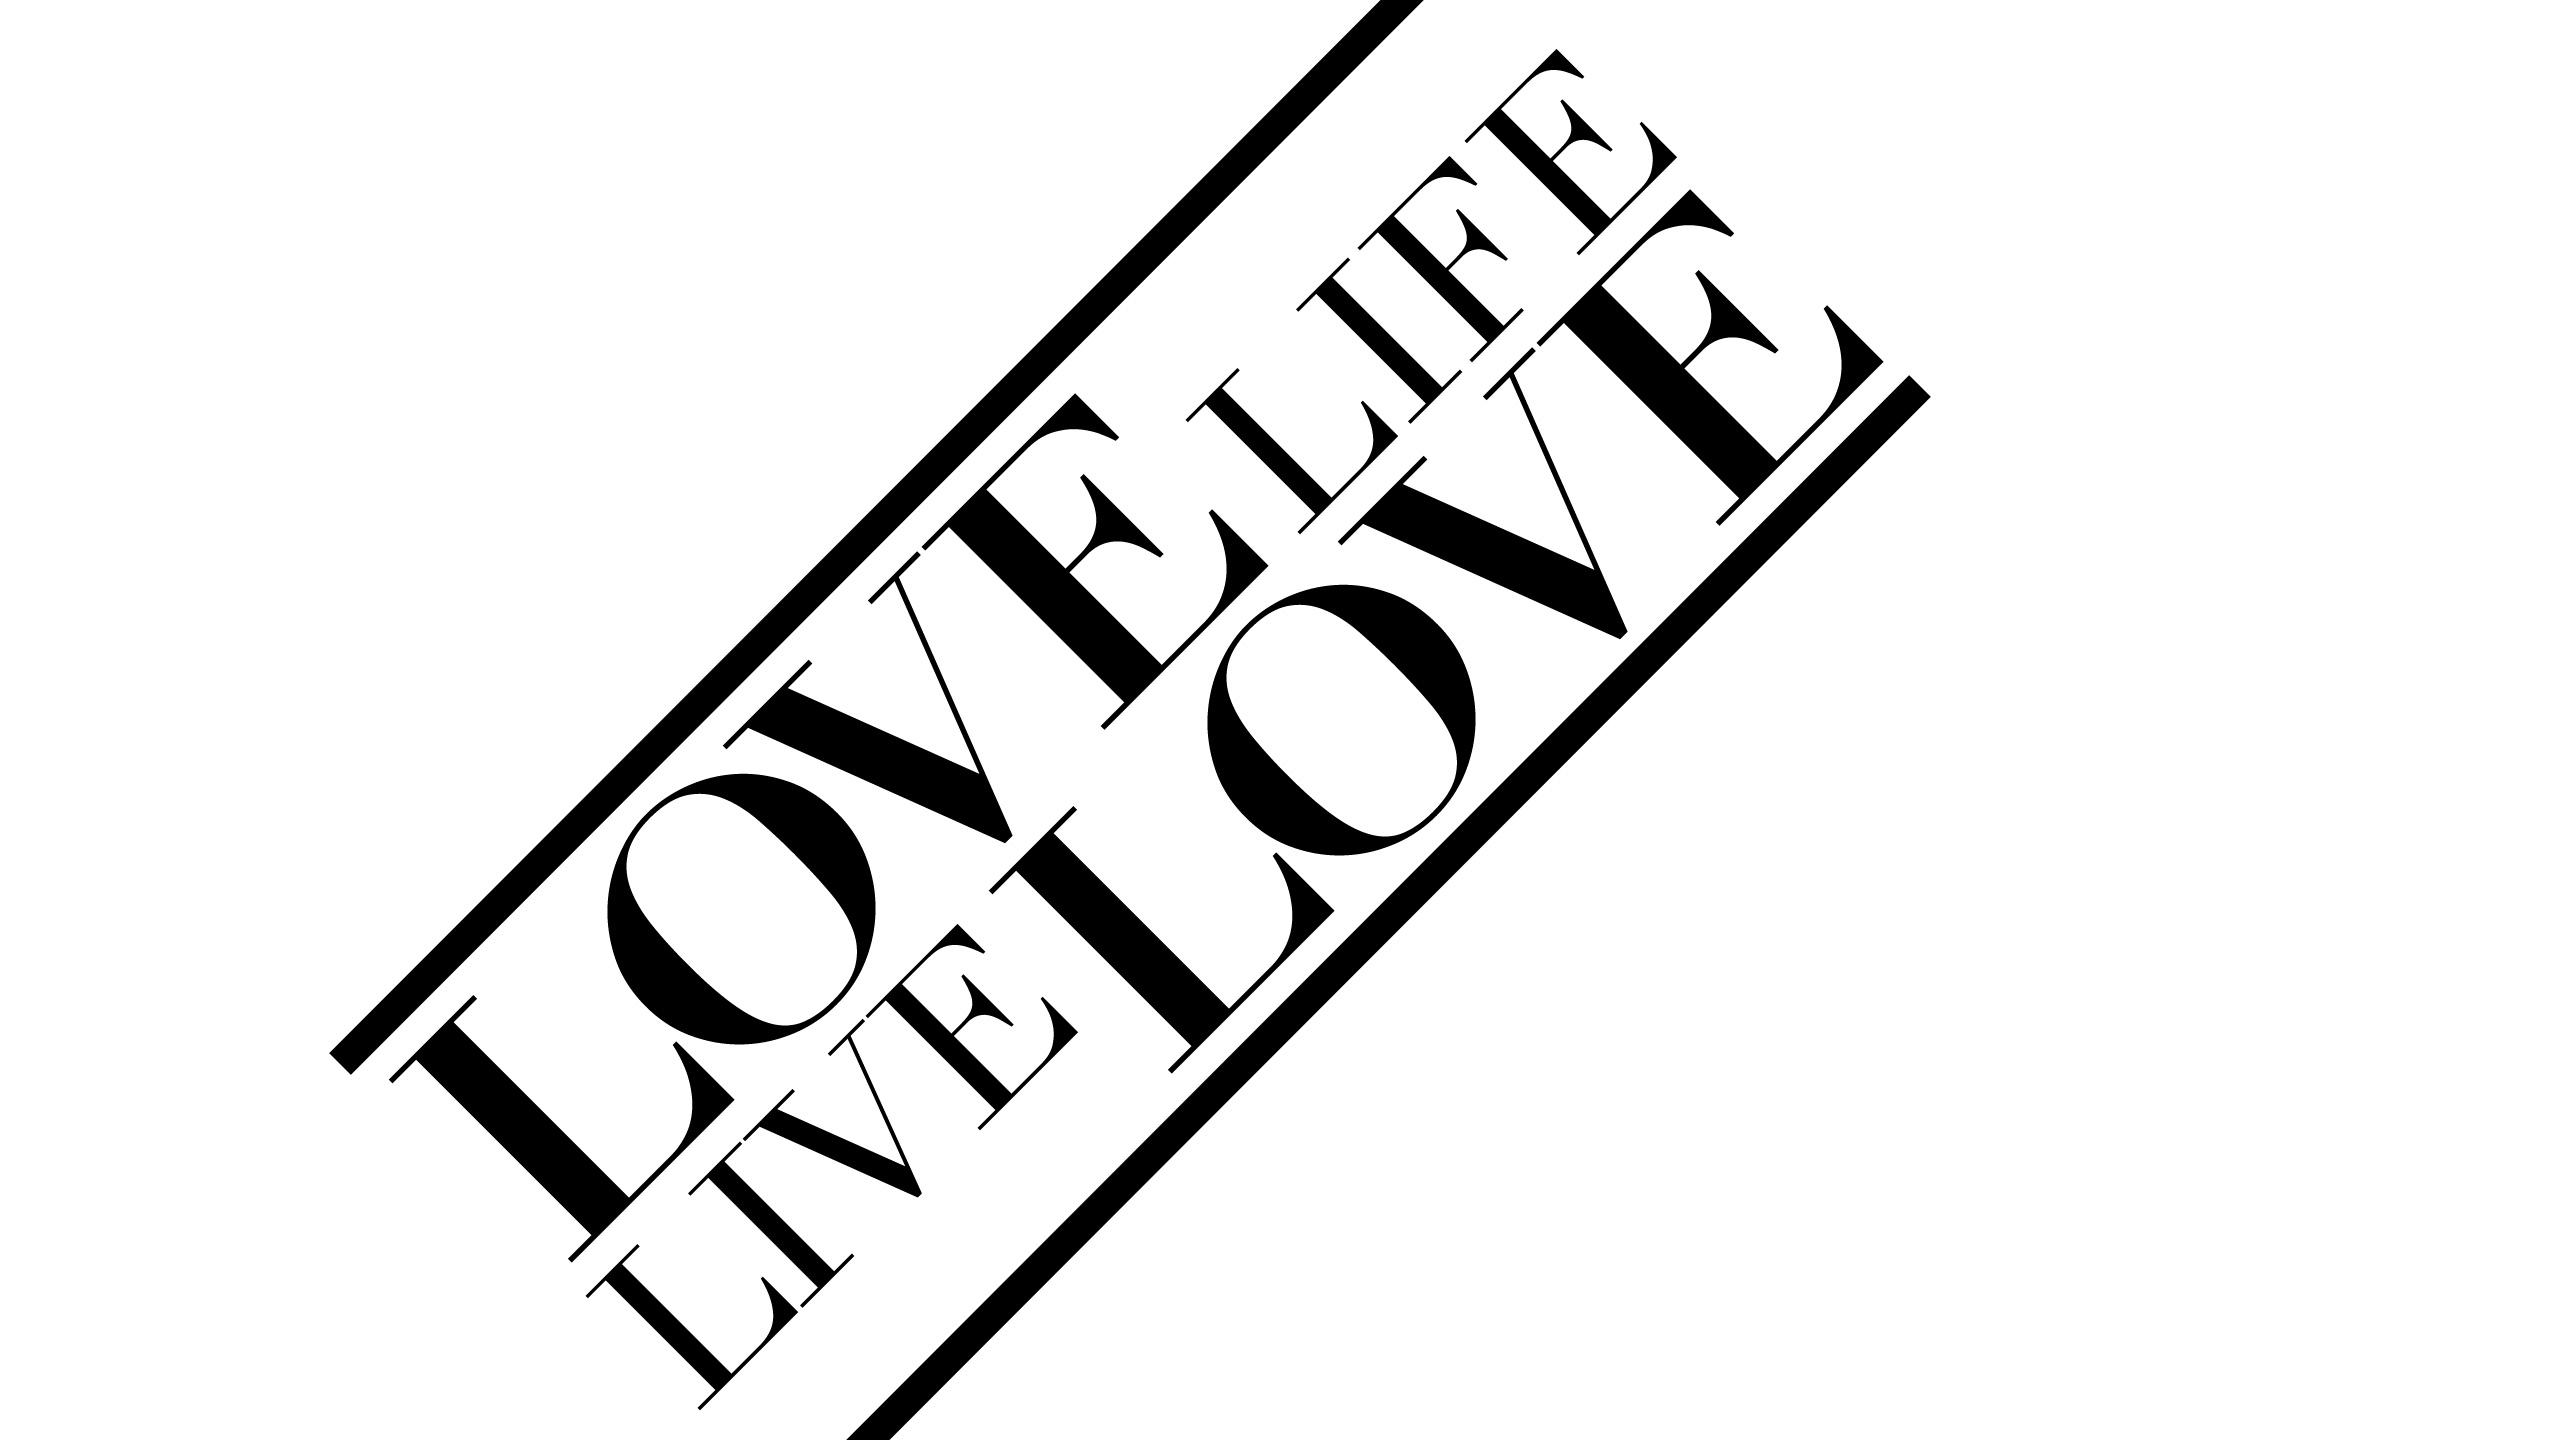 3_love_life_©gingerglarner